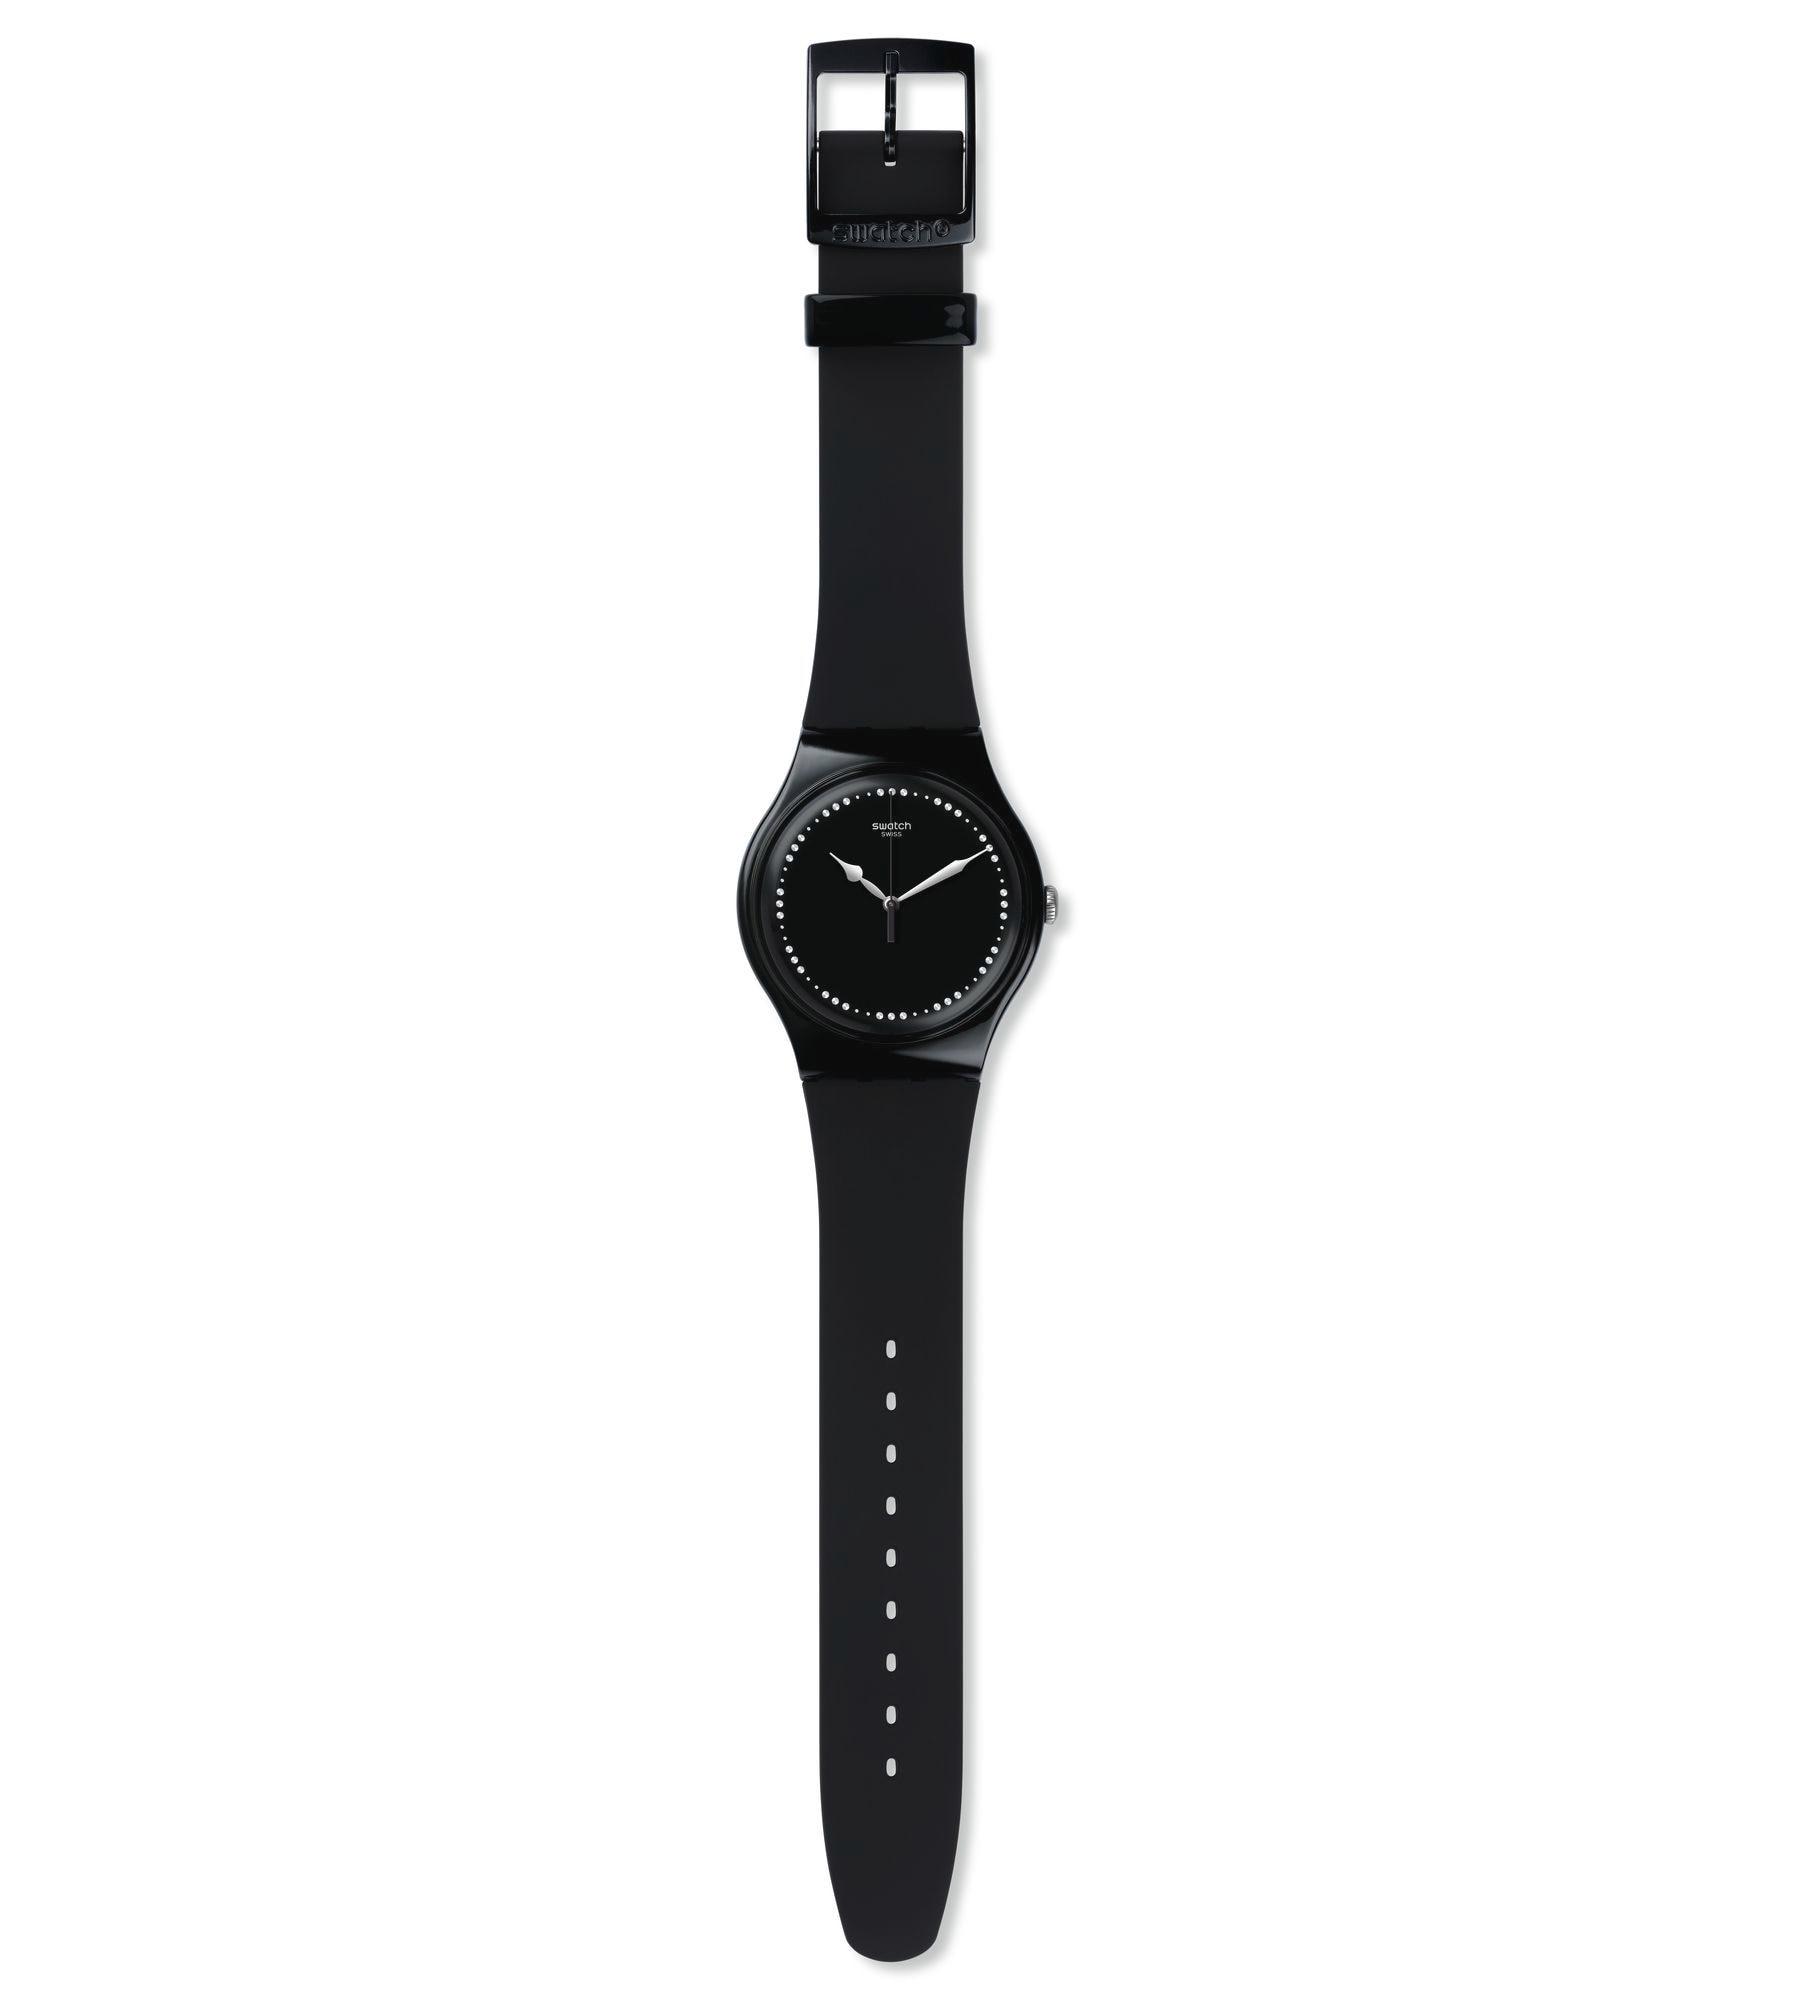 Reloj Precio Swatch Mexico Precio Swiss Reloj Mexico Swatch Reloj Swiss Precio Swiss Swatch 7vb6gYfy